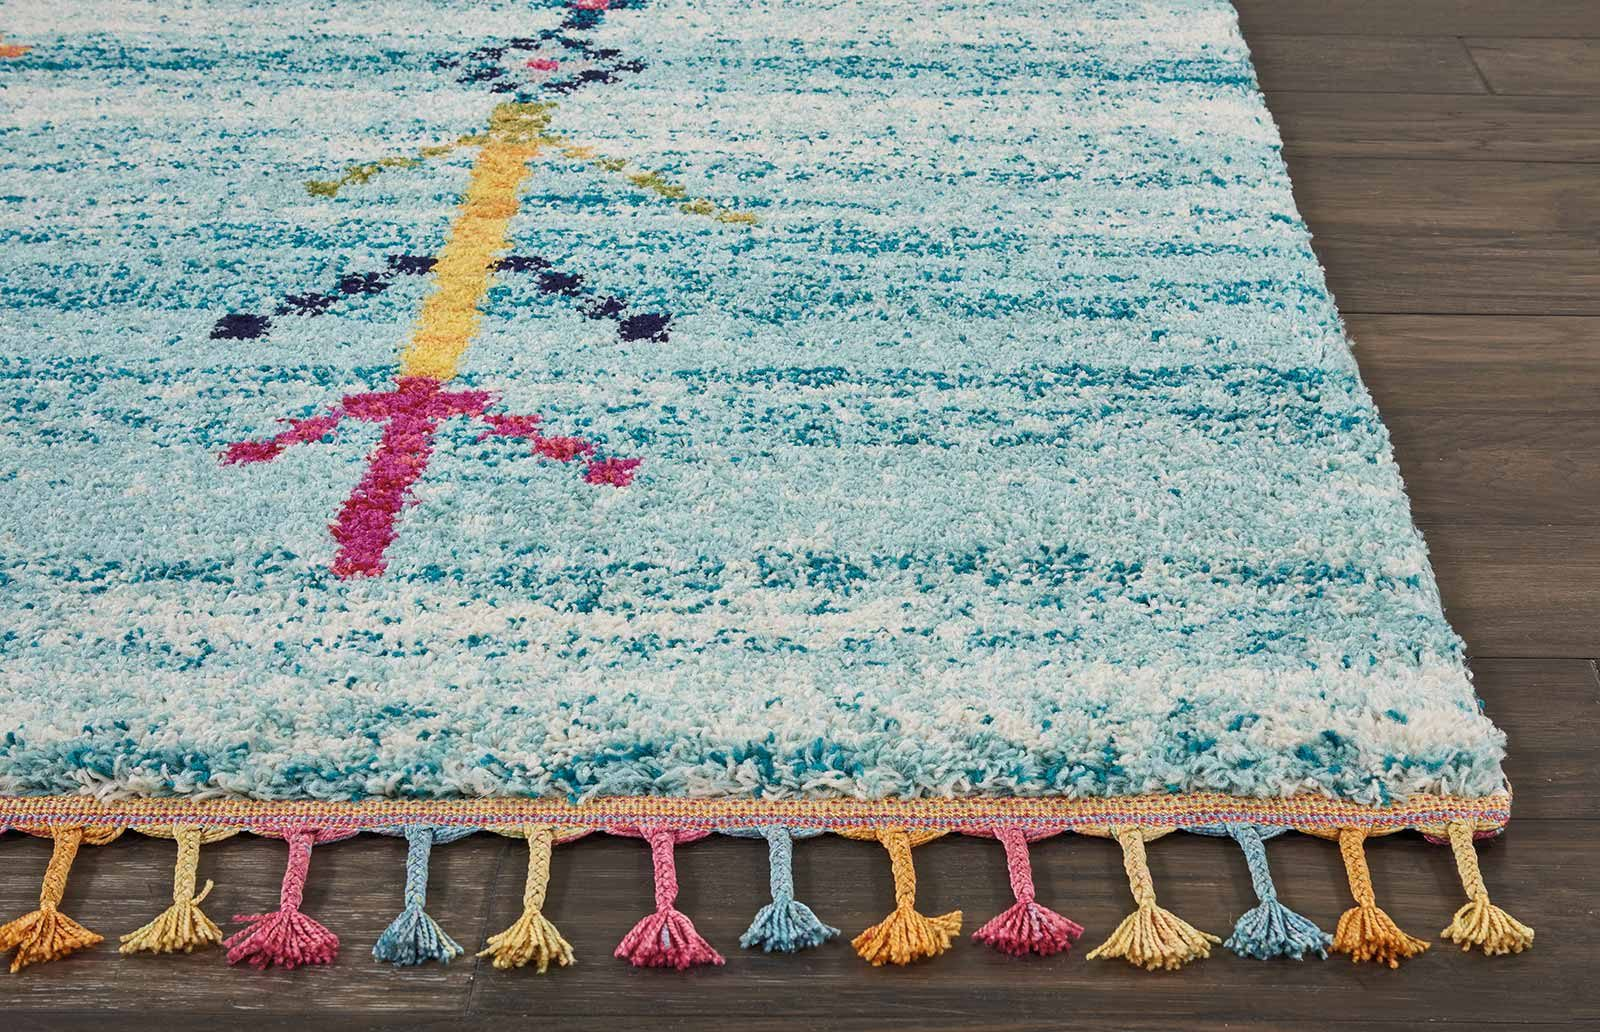 Andessi tapijt Nomad NMD04 AQUA 8x11 099446461506 DT01